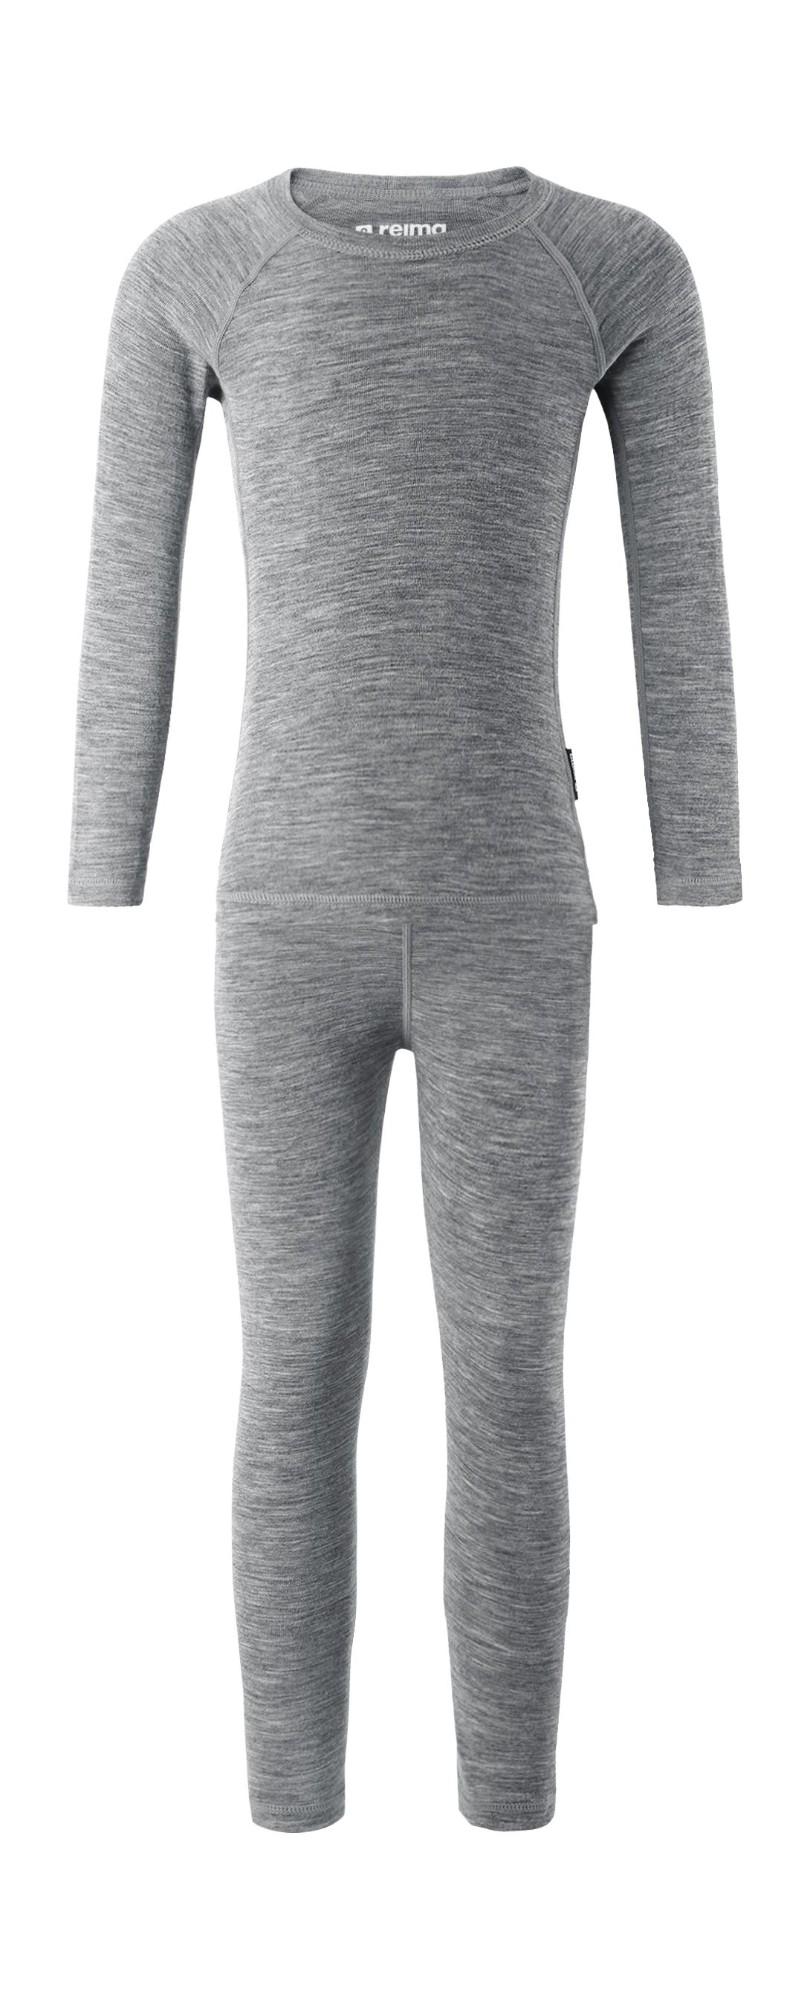 REIMA Kinsei Melange Grey 150